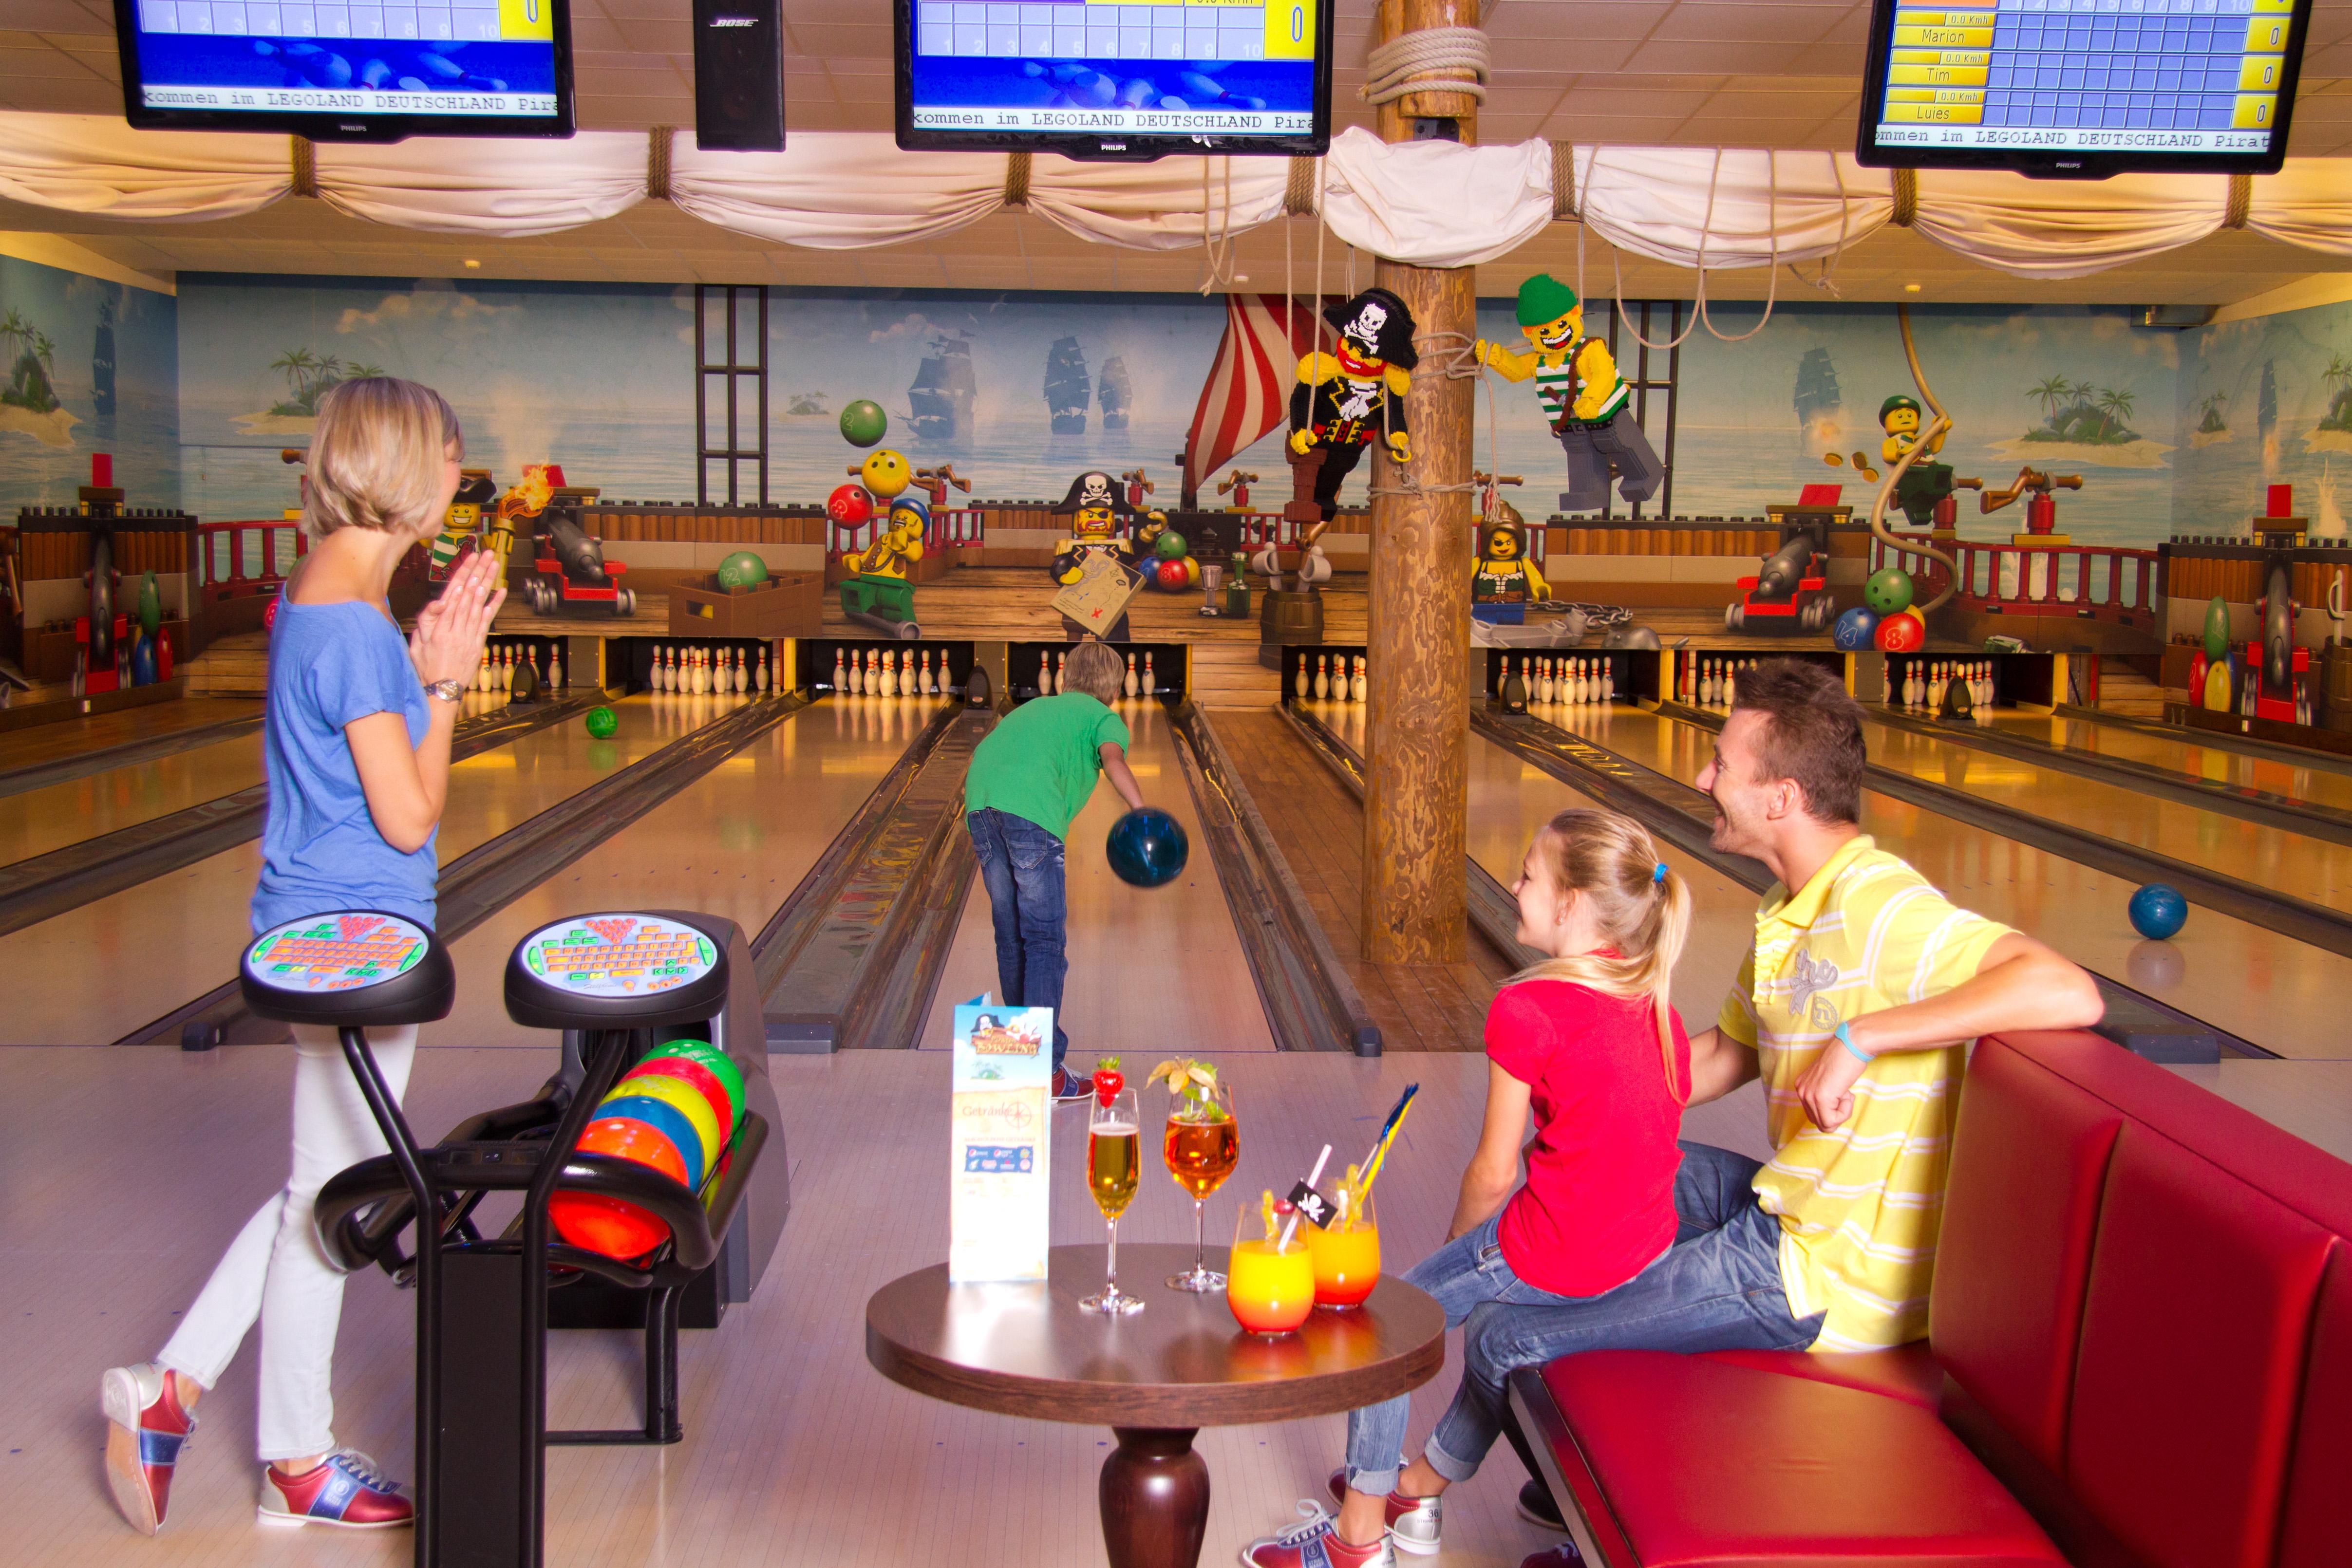 ll-feriendorf_bowlingbahn_2-large-2